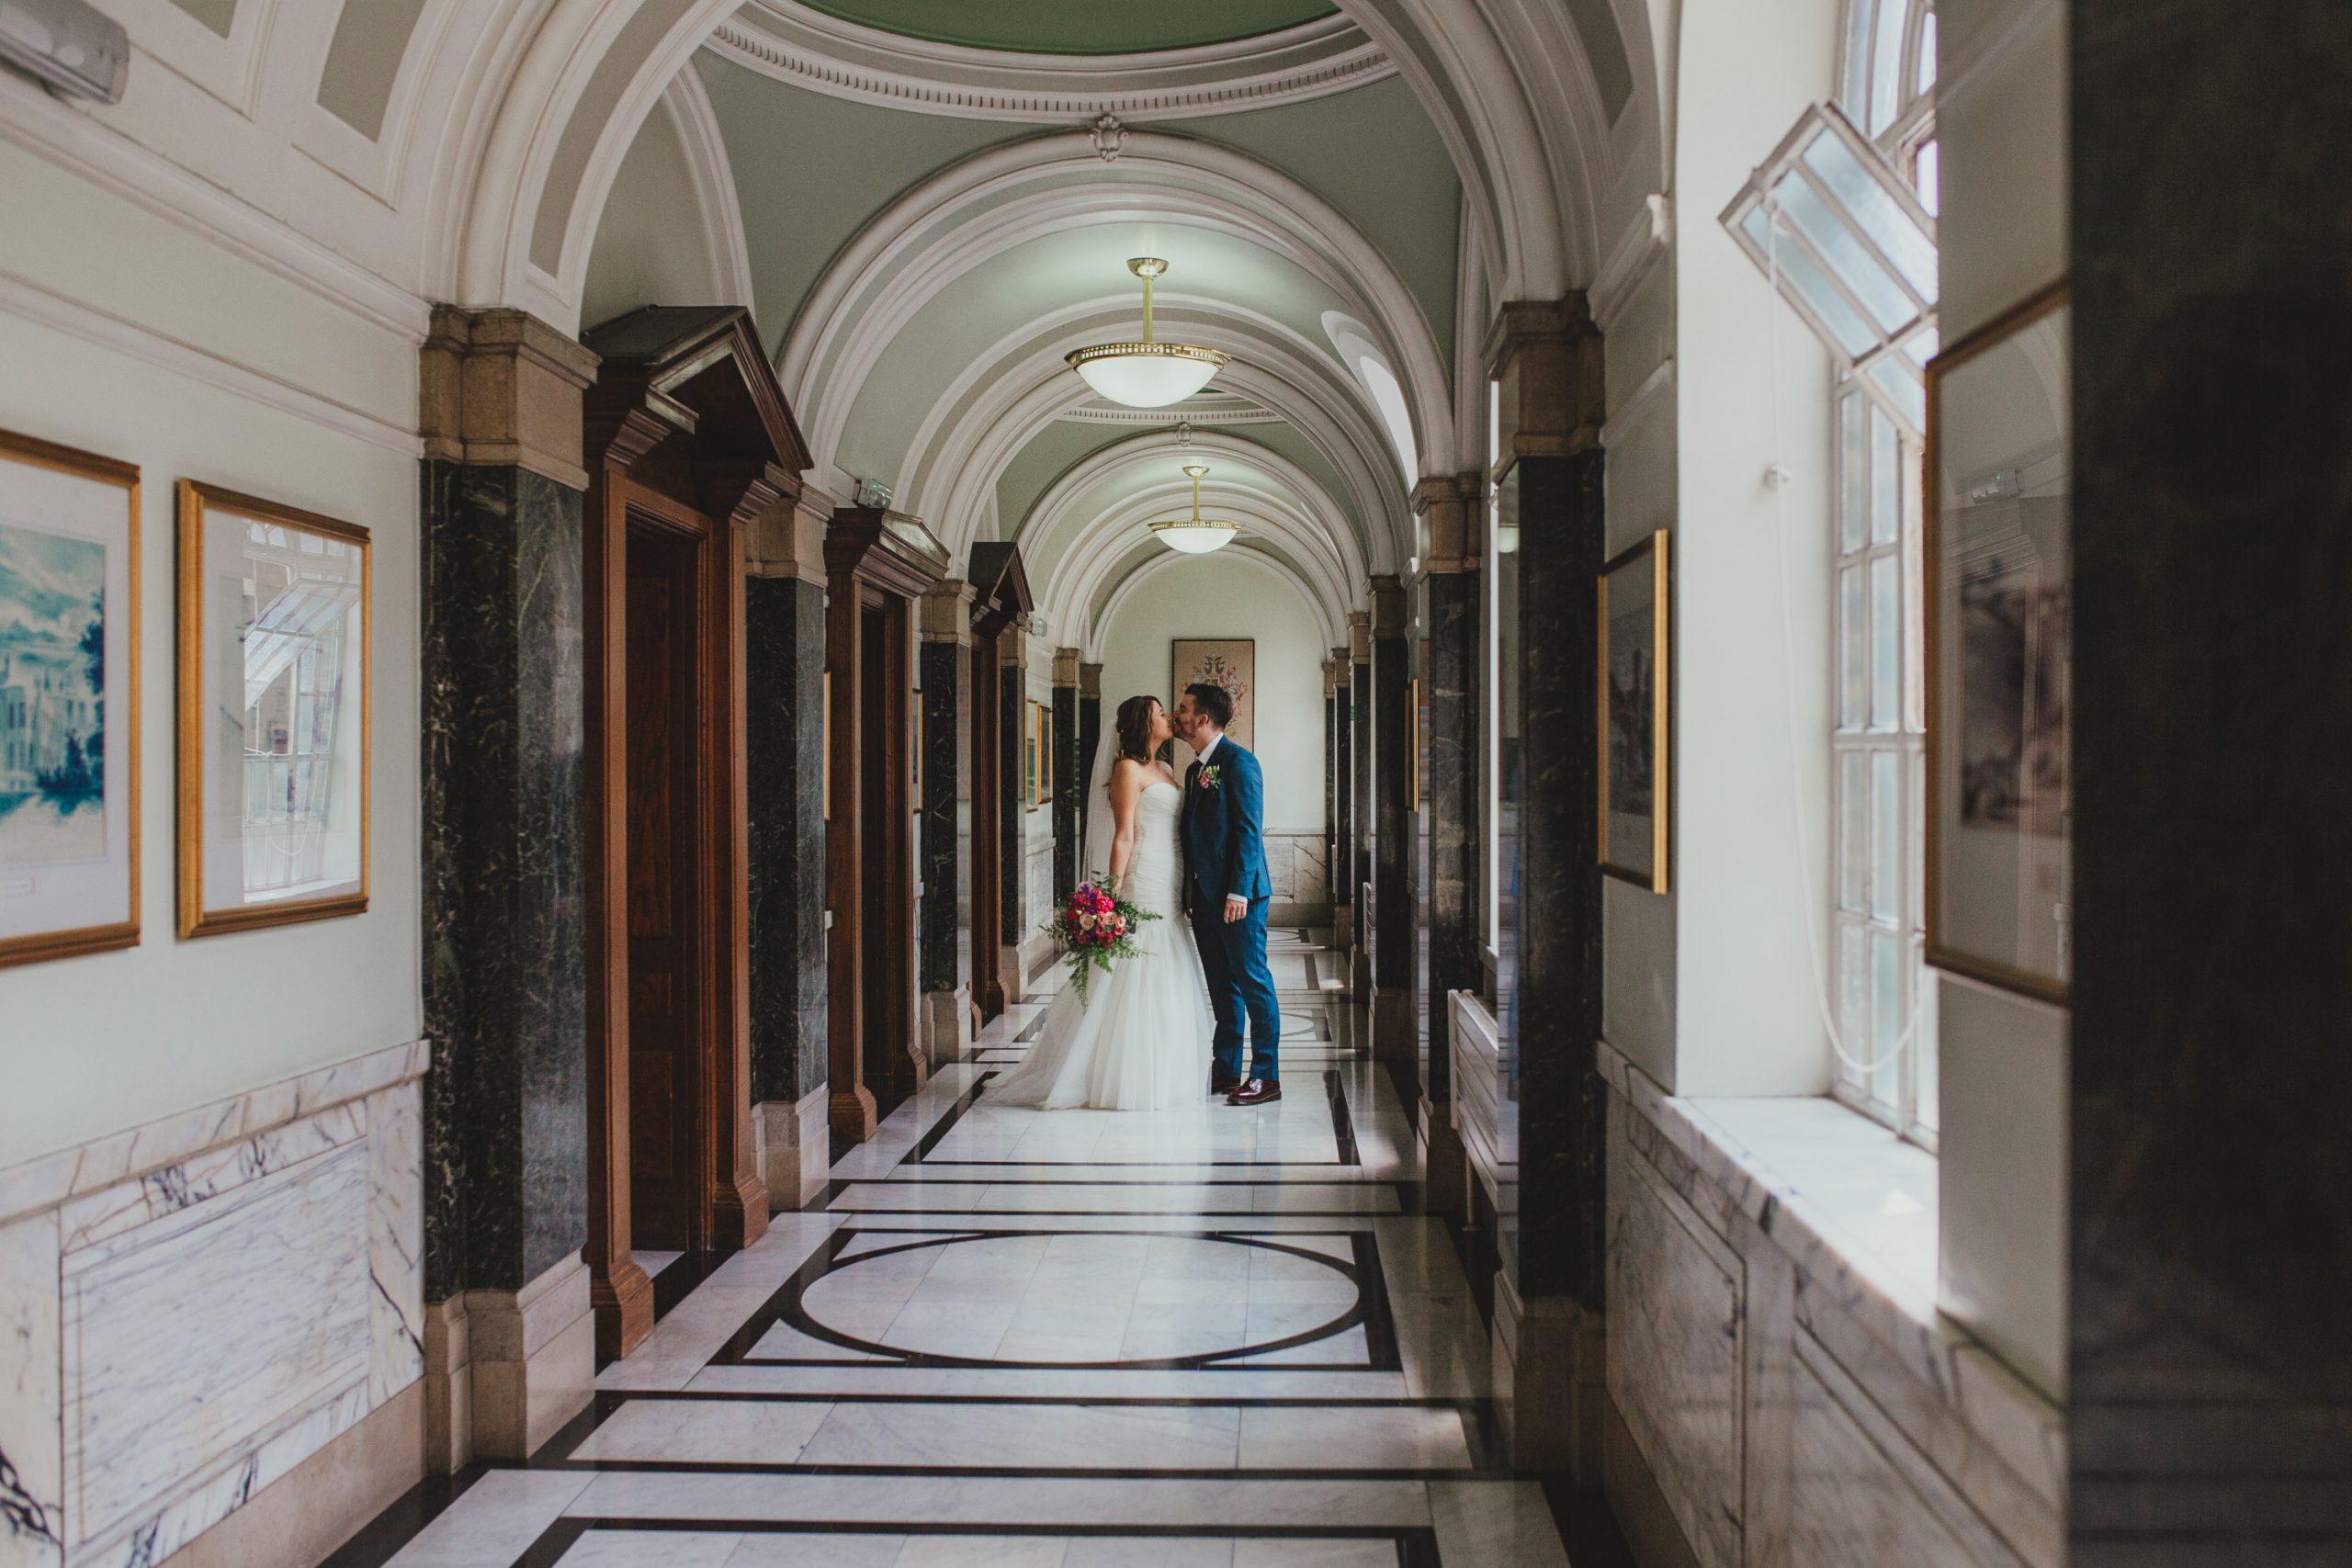 weddings at Islington Town Hall, Stoke Newington Town Hall and Hertford Town Hall